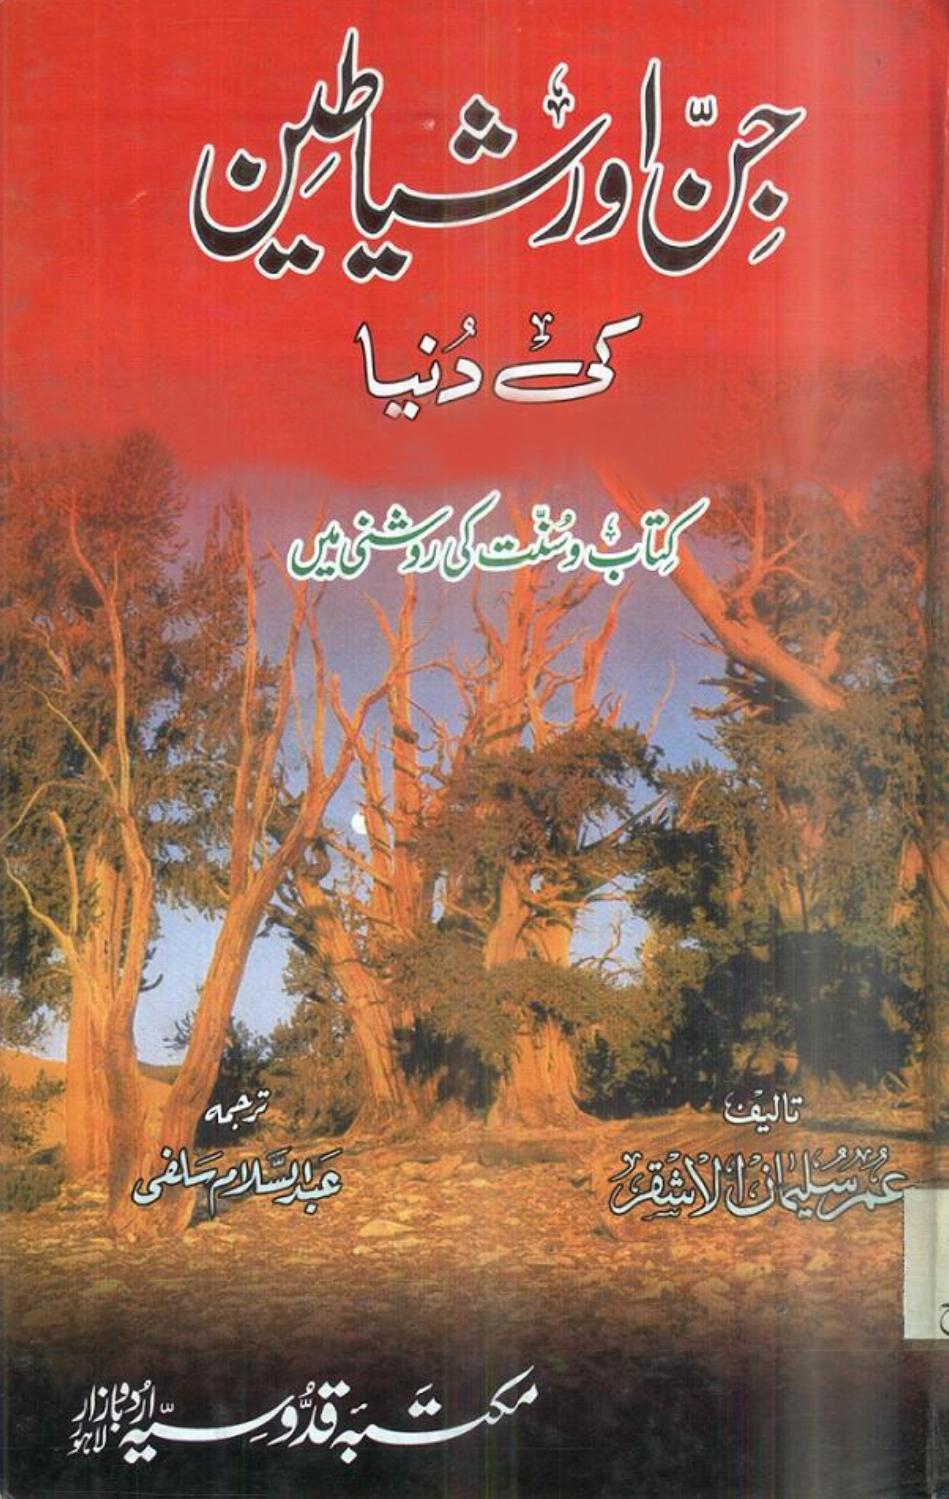 Jin Aur Shayateen Ki Duniya PDF Free Download